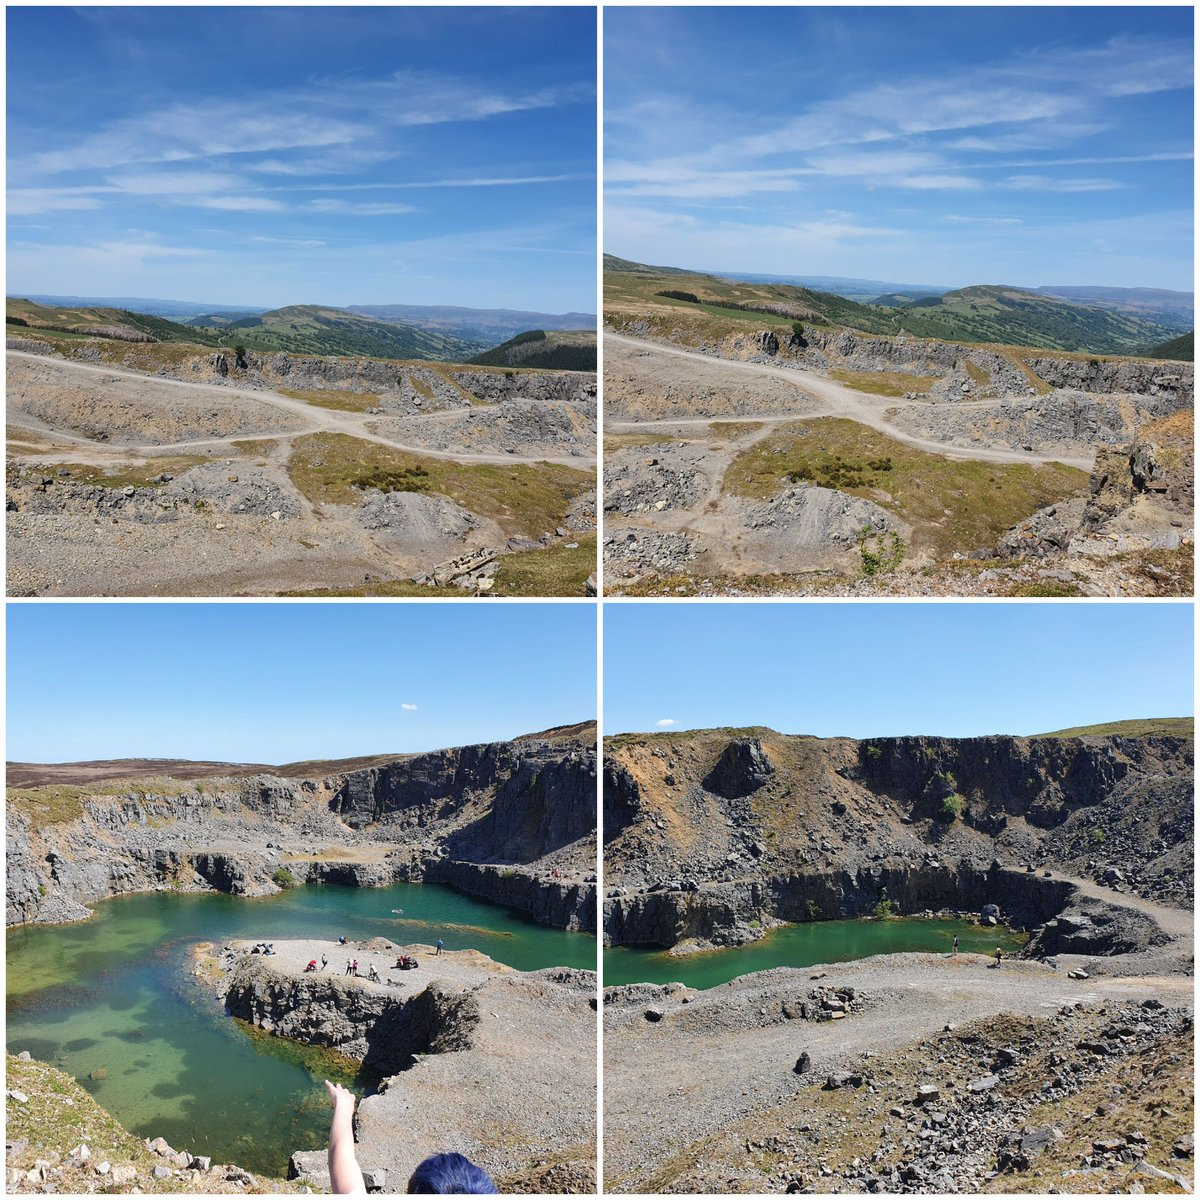 the blue pool in trefil is not a myth #views x pic.twitter.com/E4JUWIH7U5